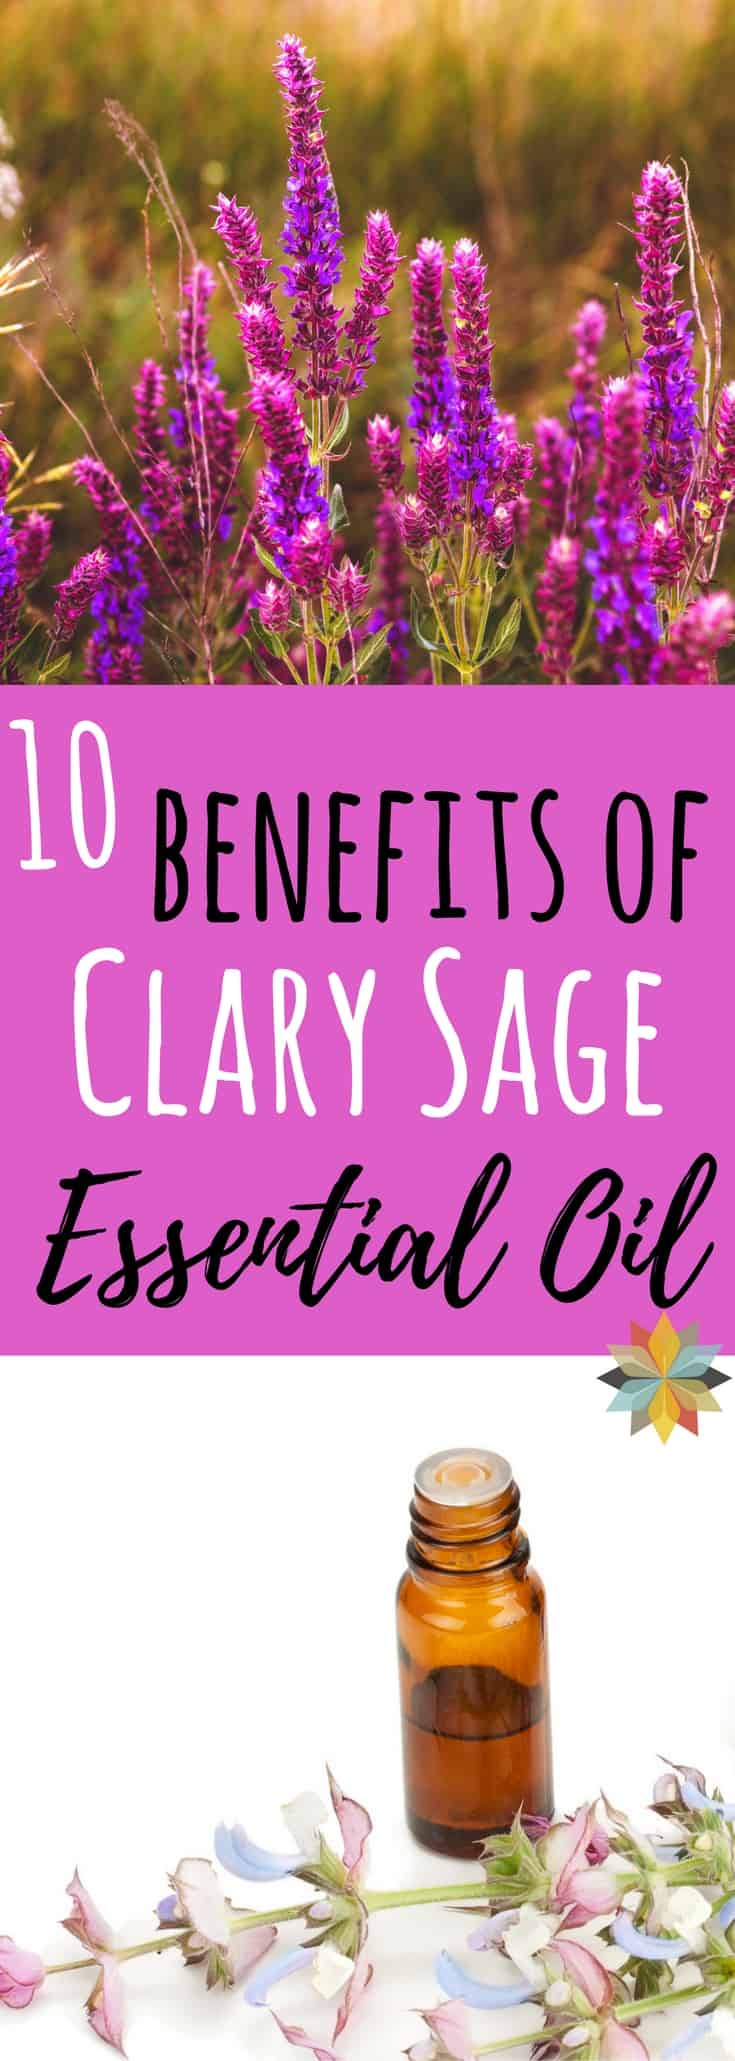 Clary Sage Benefits